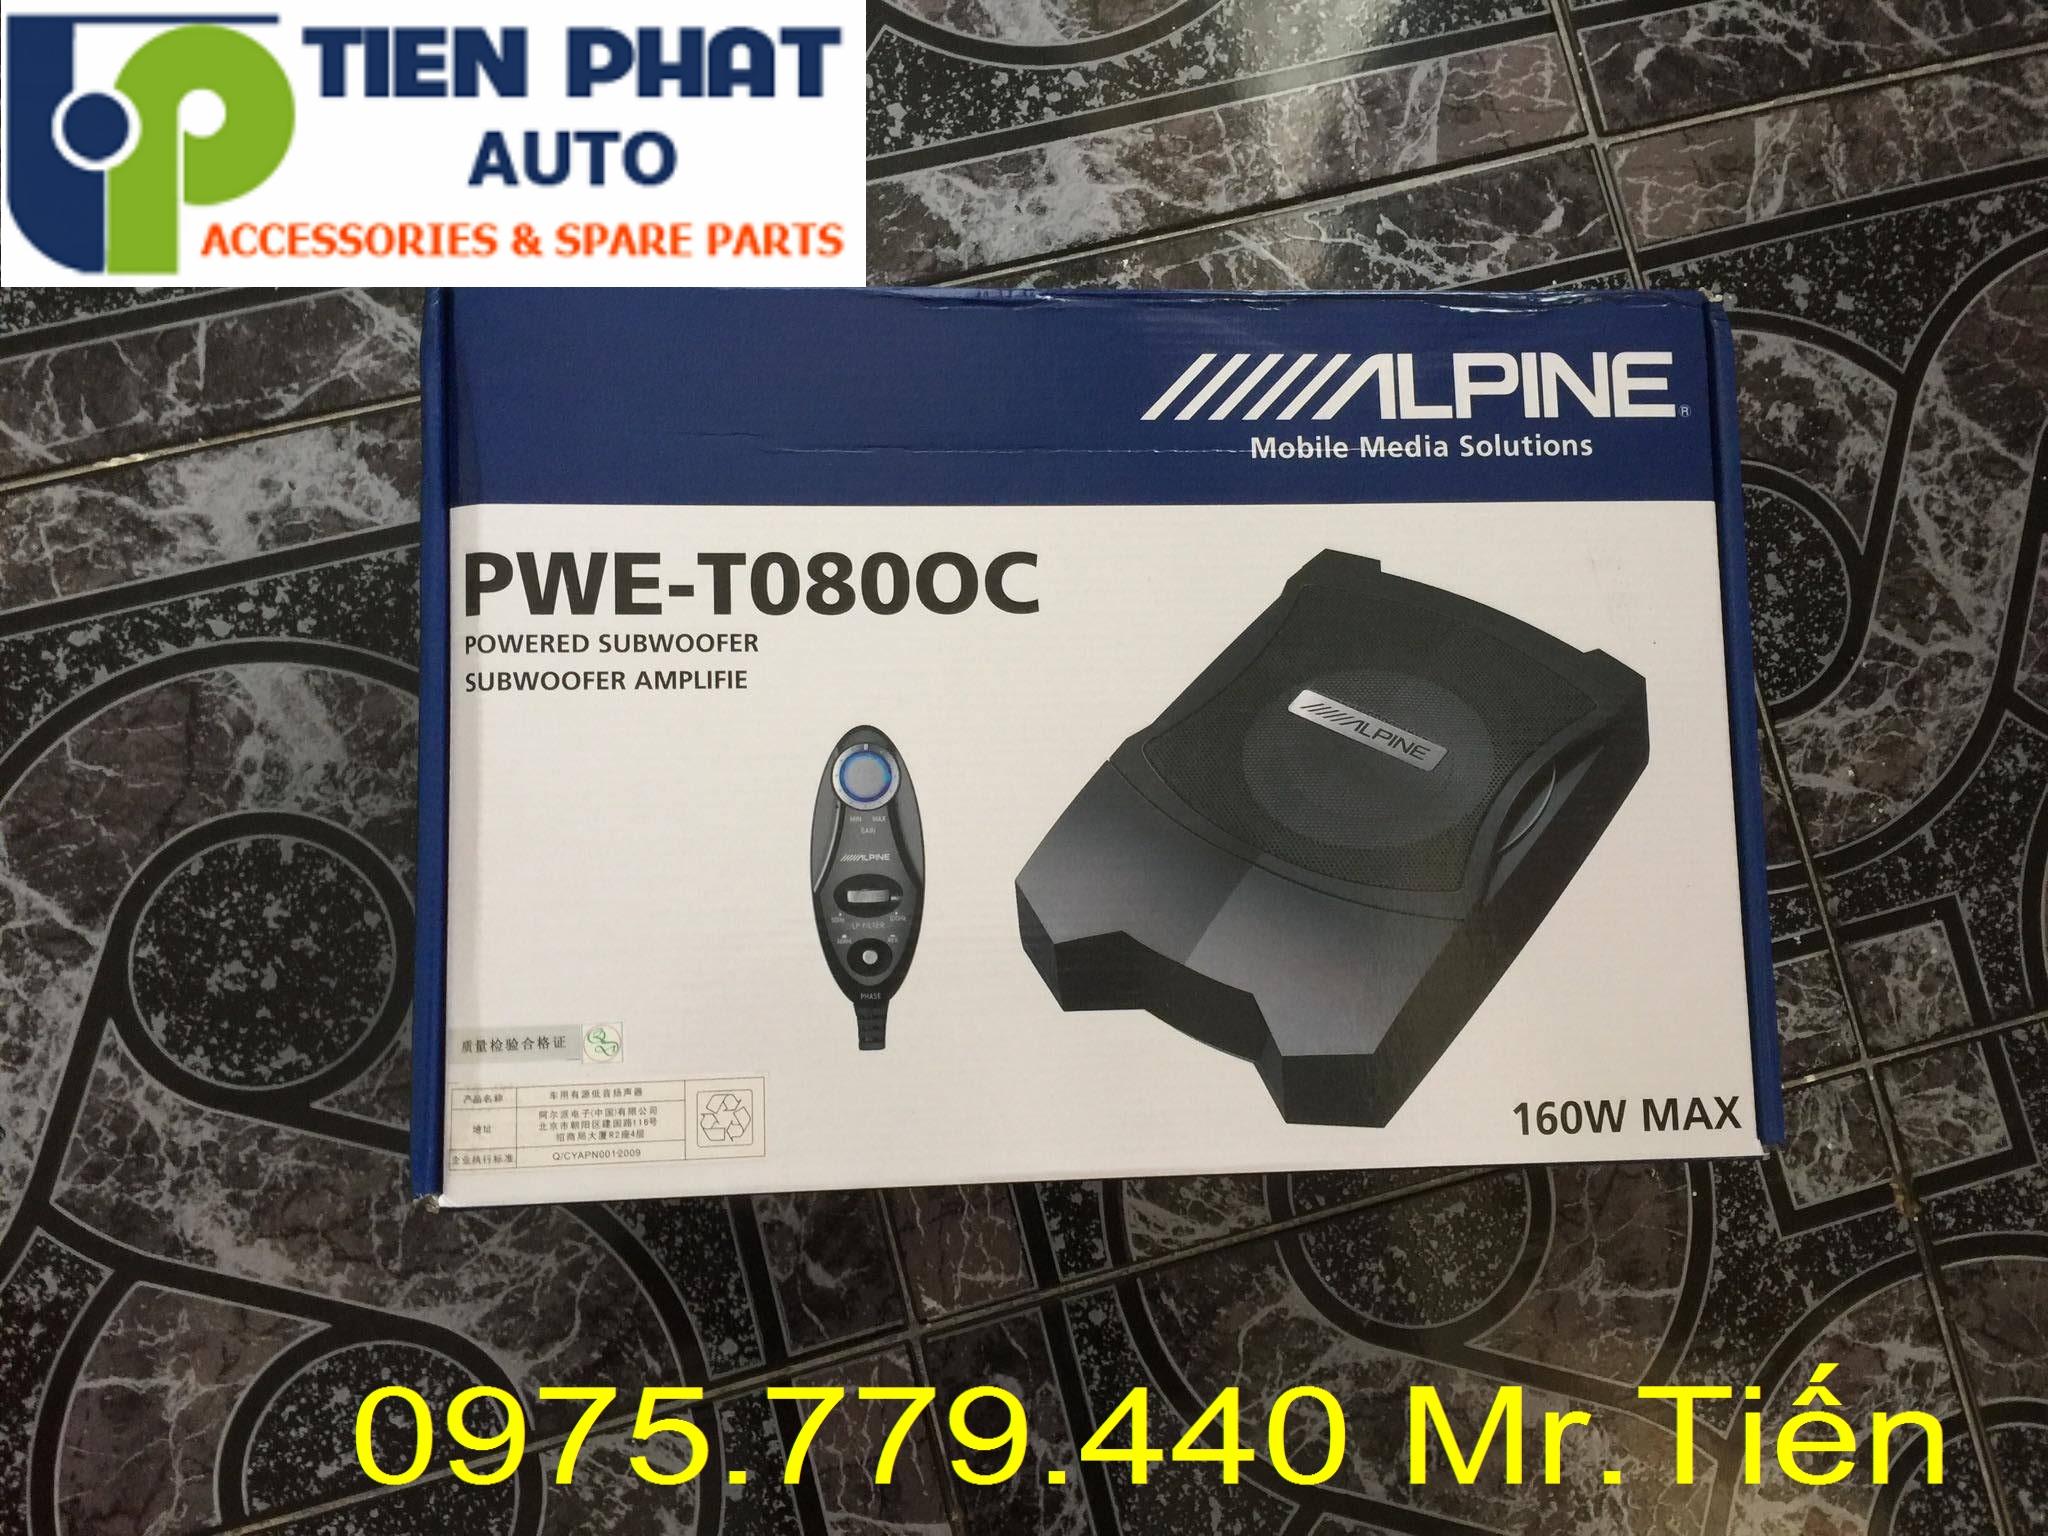 Lắp Loa sub Alpine PWE-T0800C cho Kia K3 Lắp Đặt Tận Nơi